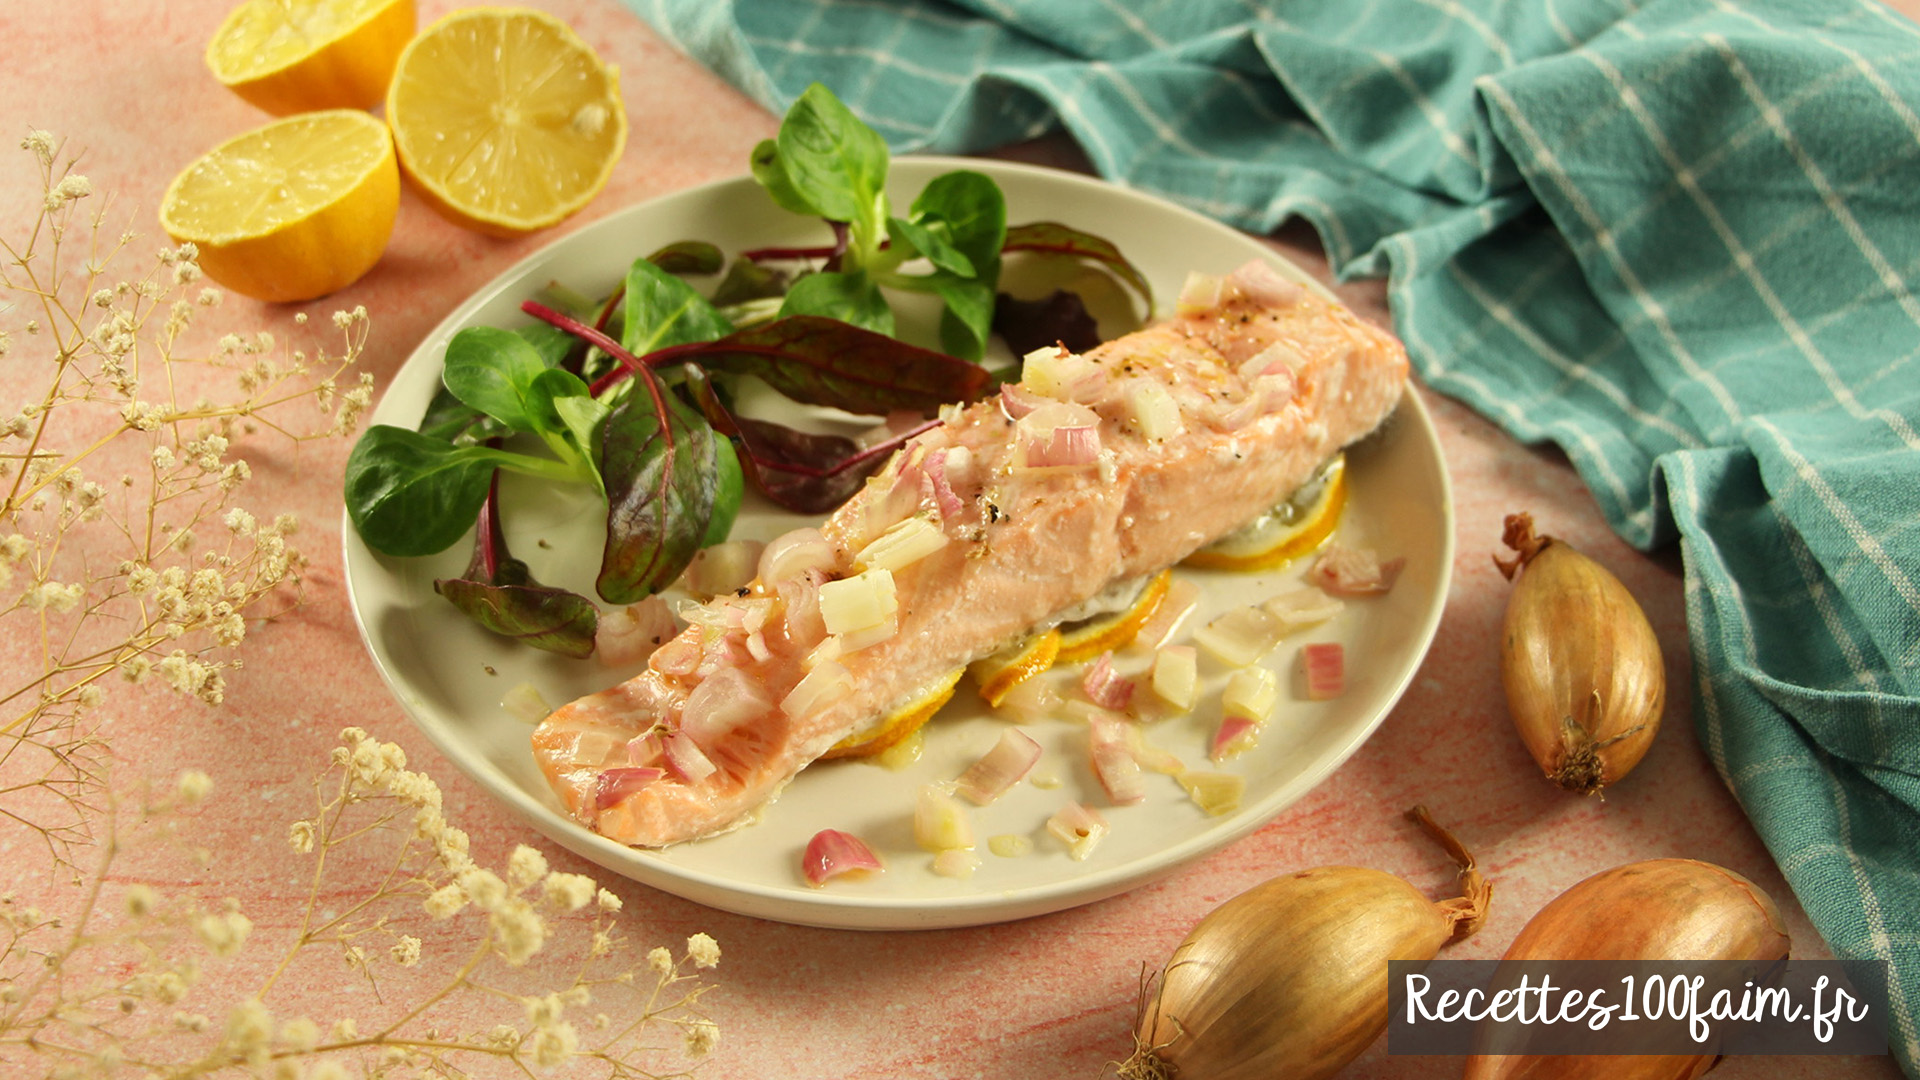 recette saumon four echalote vin huile citron